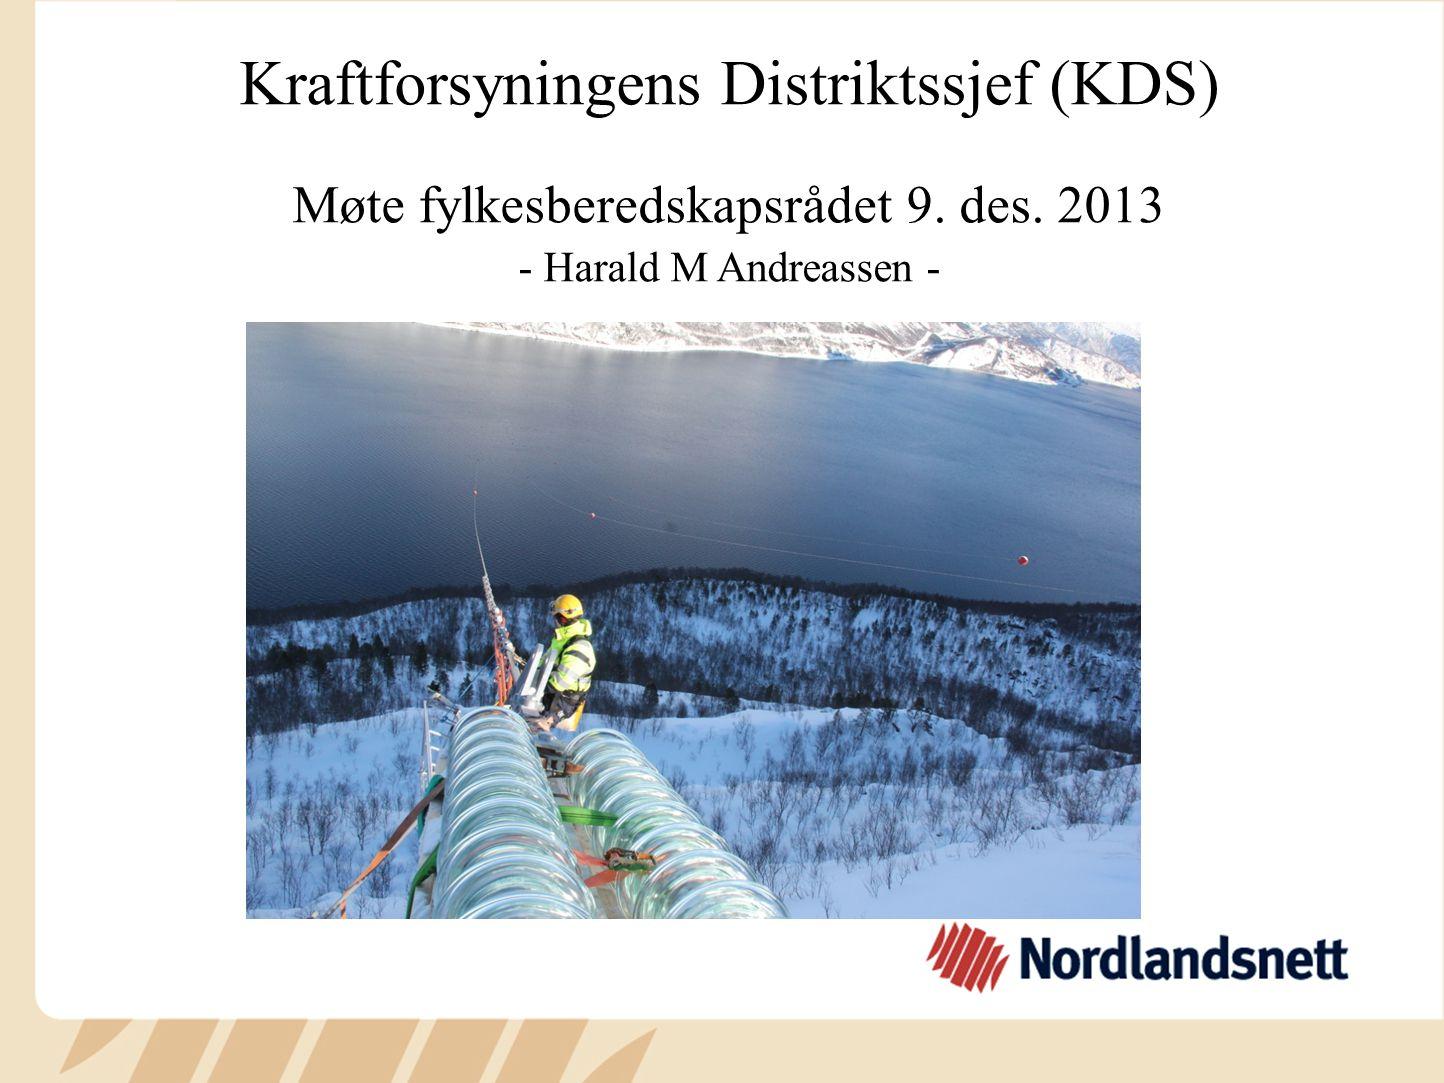 Kraftforsyningens Distriktssjef (KDS) Møte fylkesberedskapsrådet 9. des. 2013 - Harald M Andreassen -